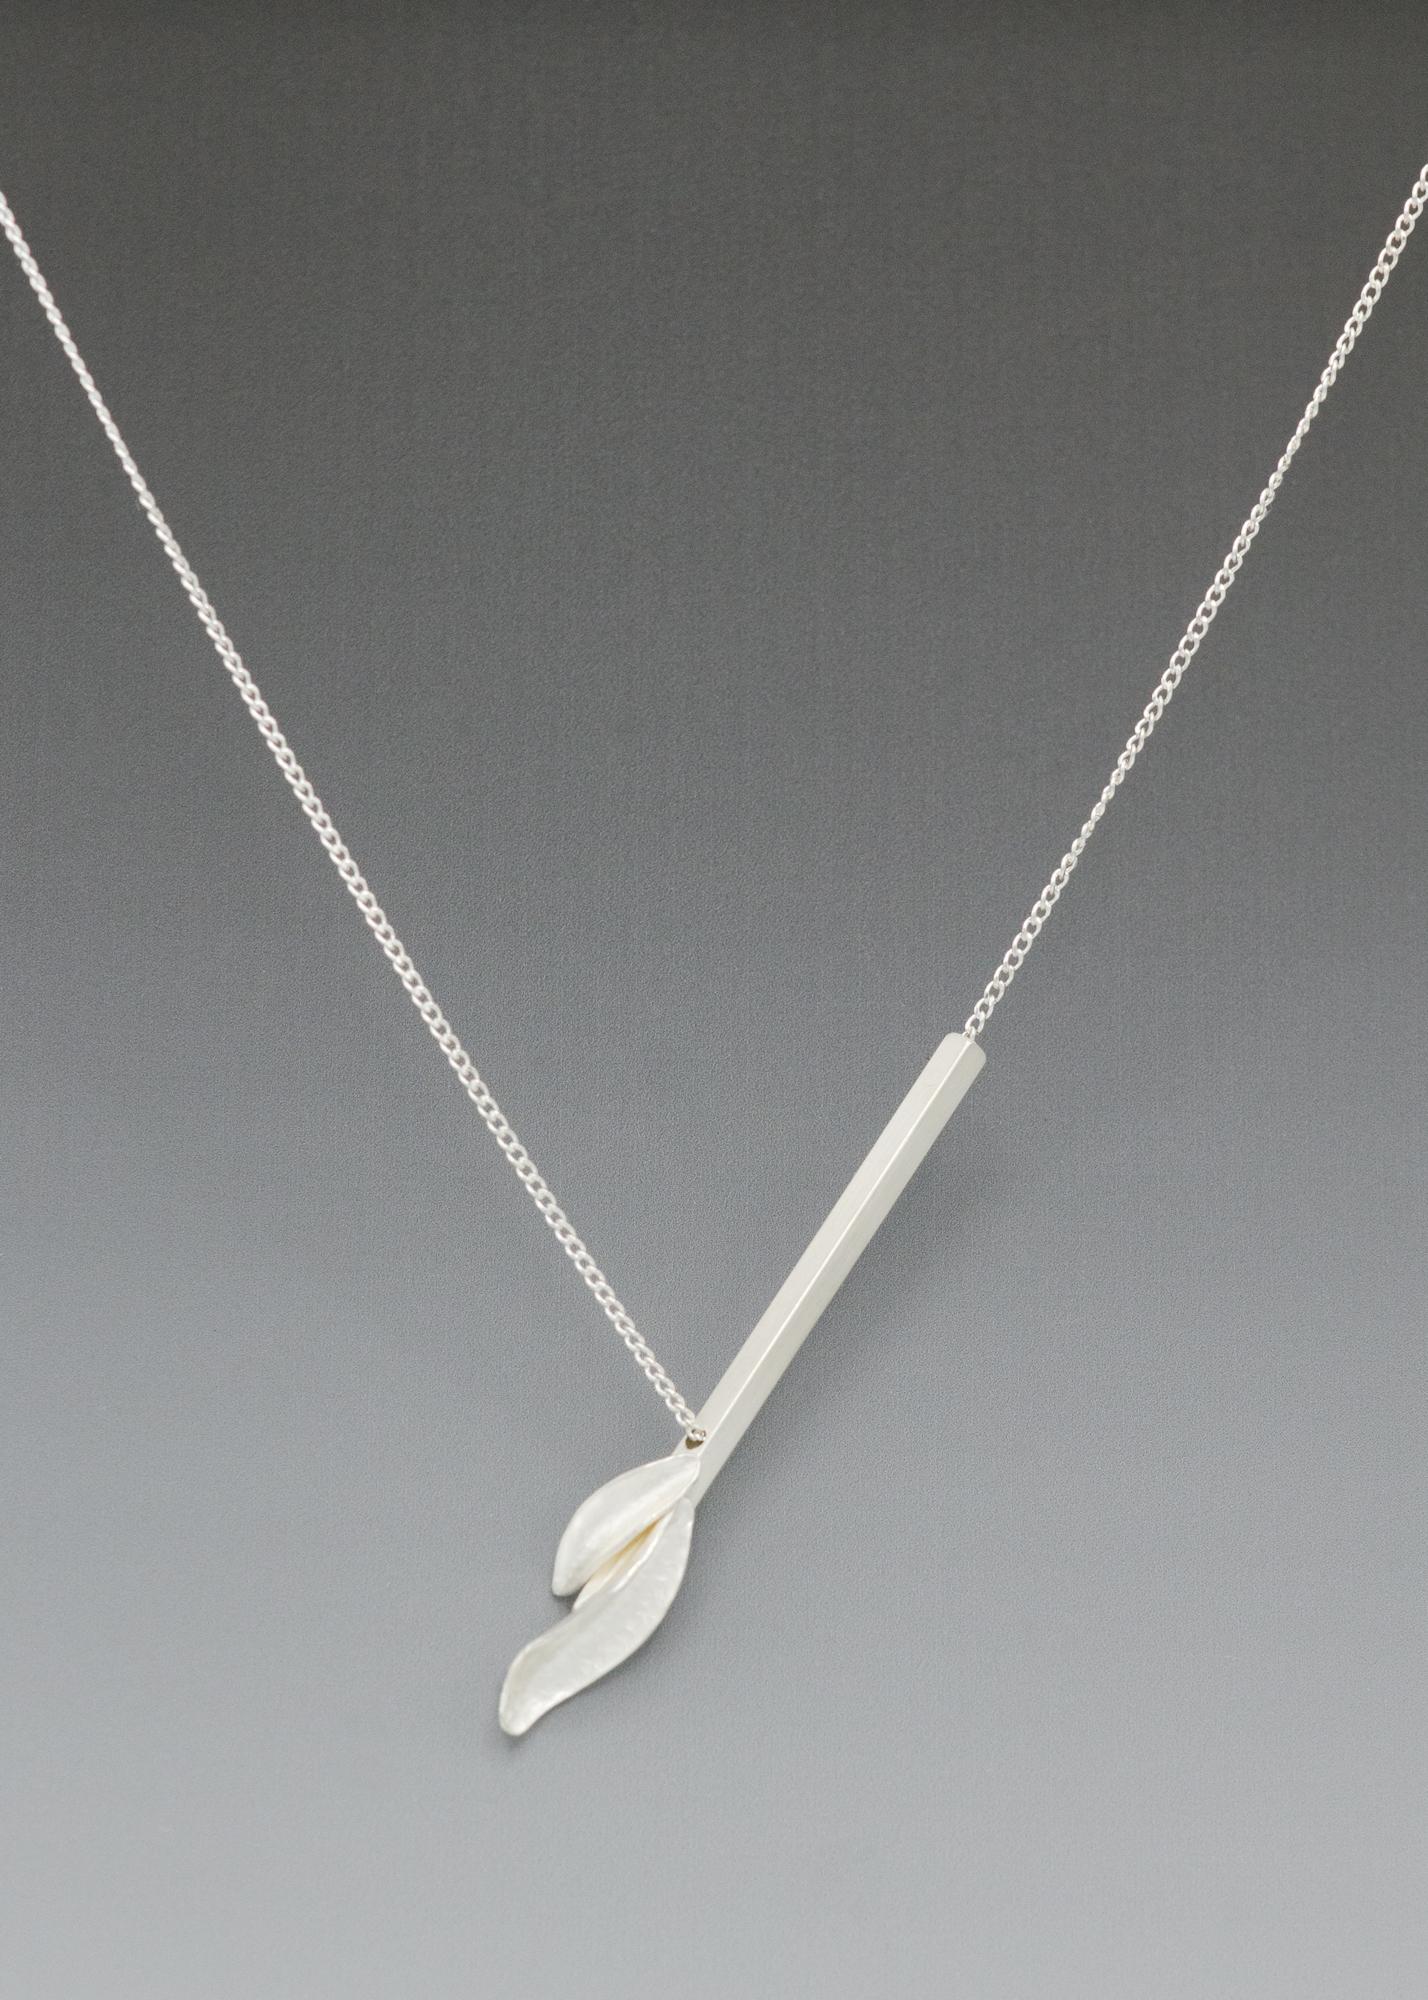 Asymmetrical_Bar-Necklace-CG_Grisez-7632.jpg